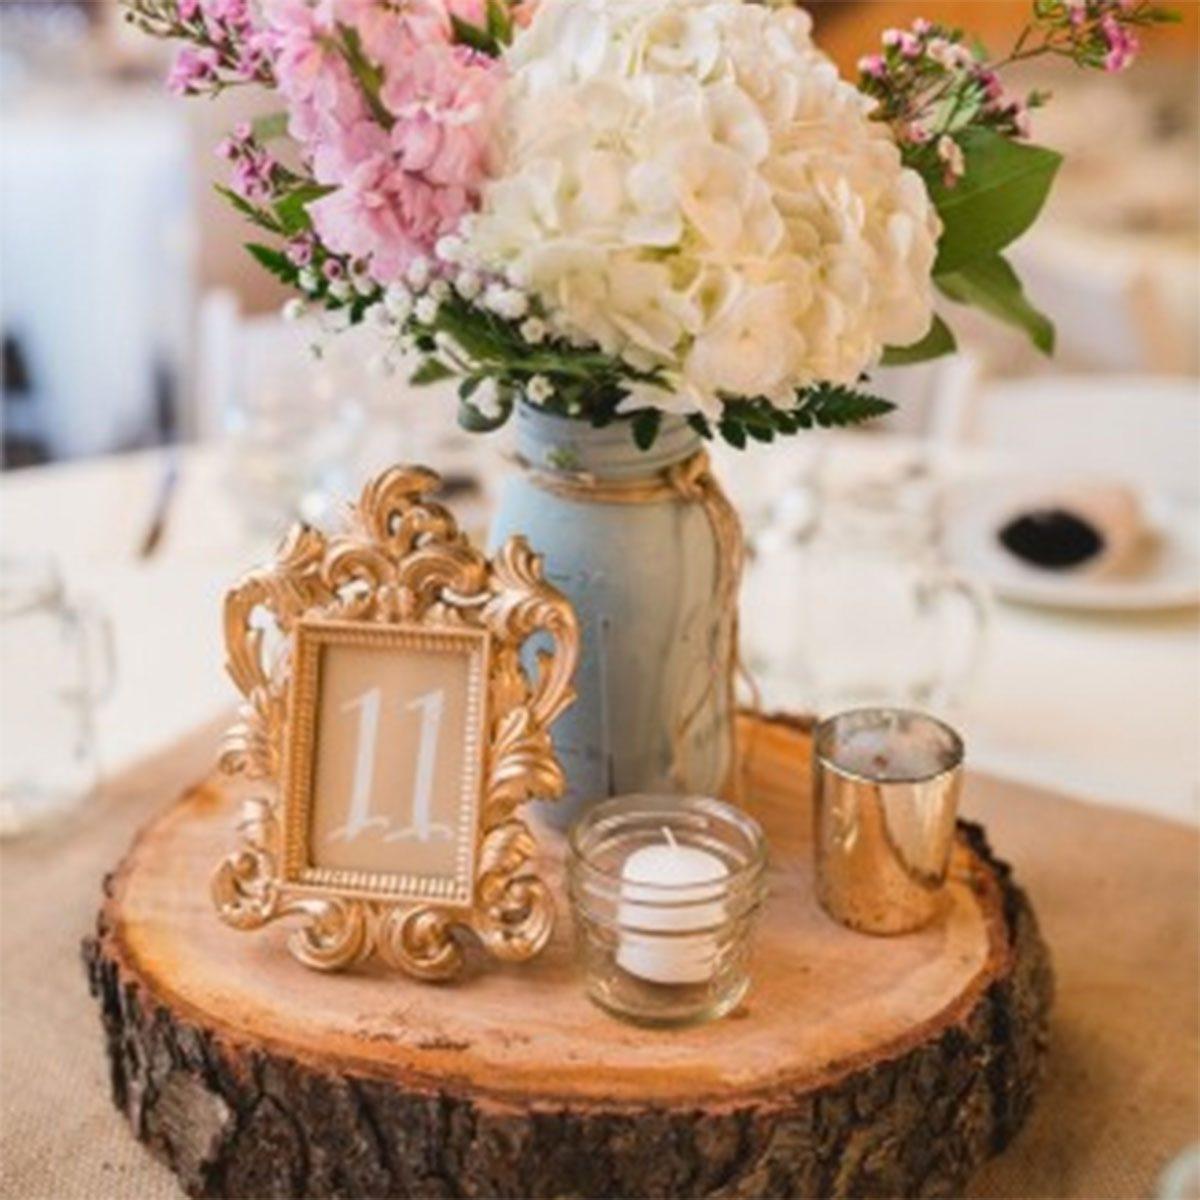 12 crafty ideas for diy table centerpieces